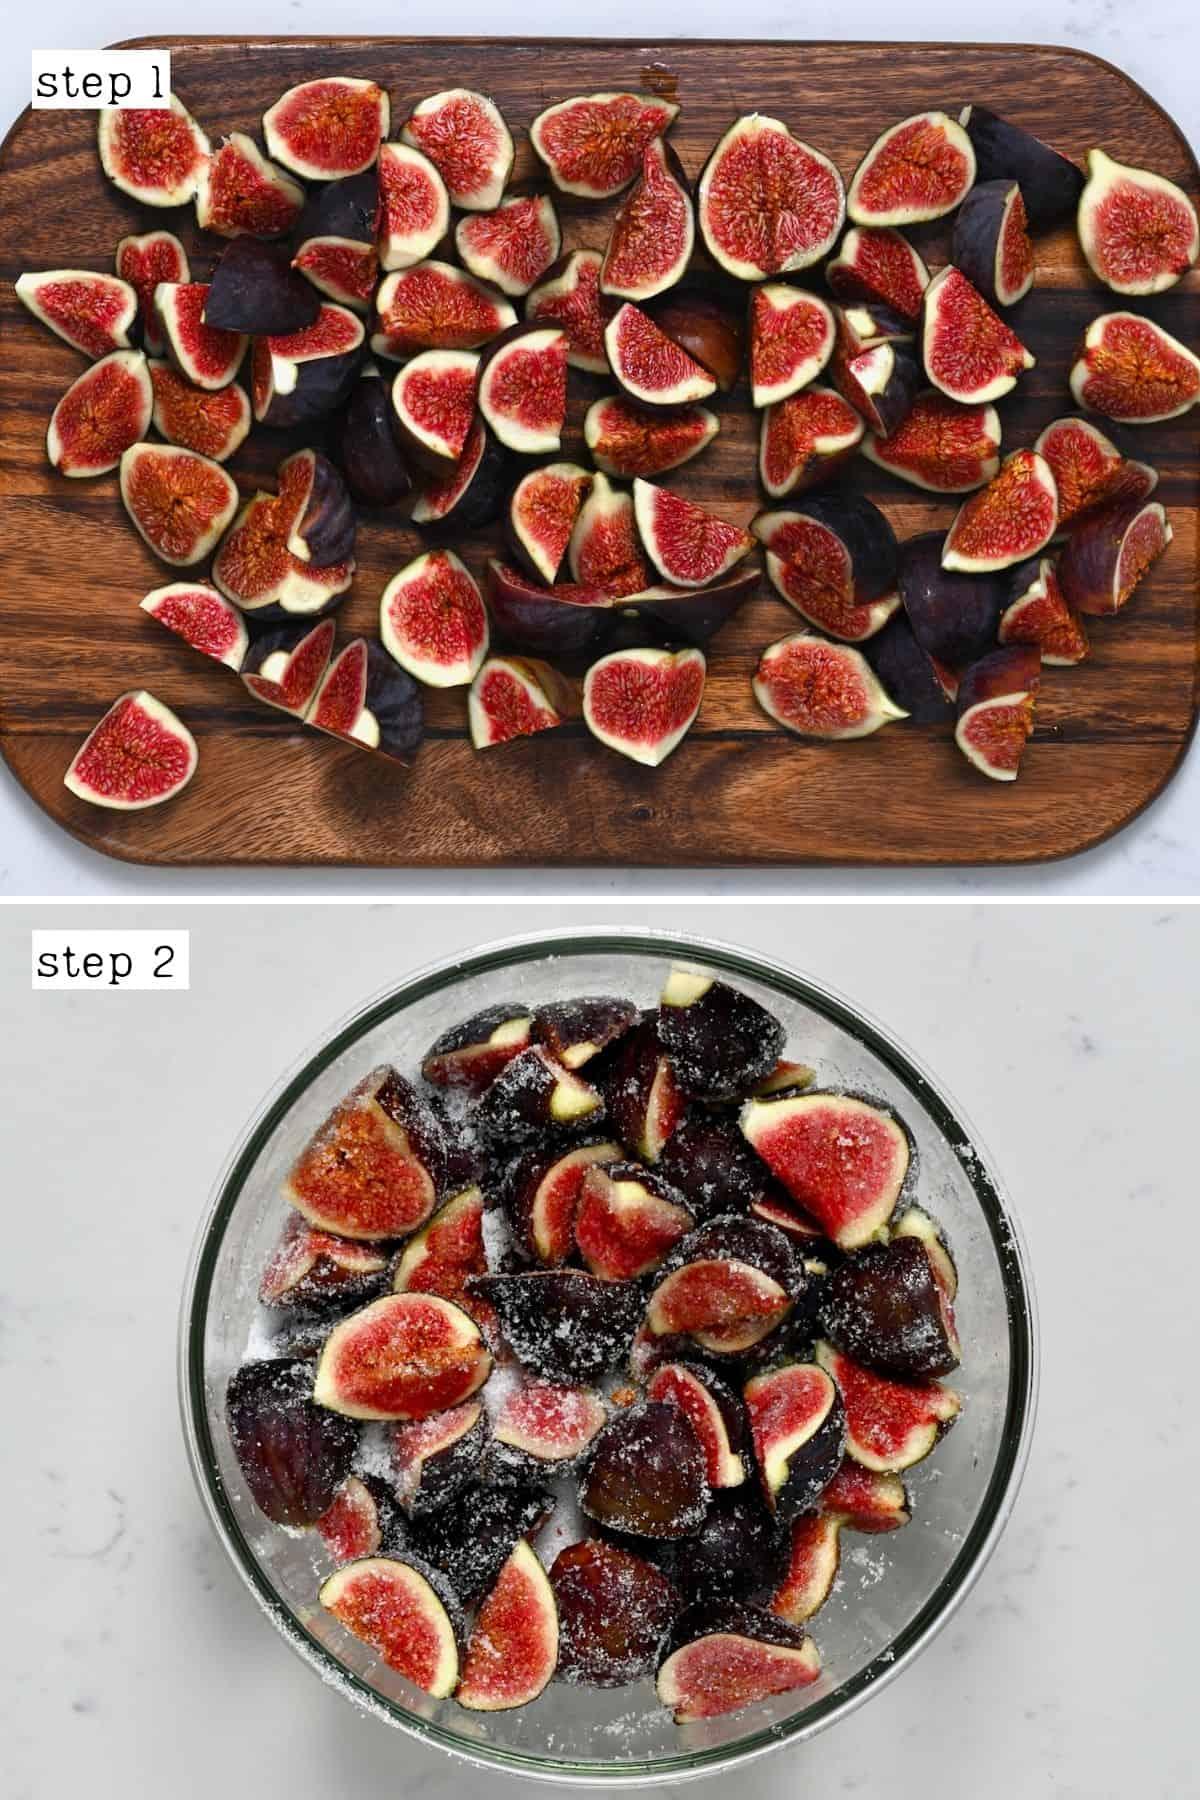 Steps for preparing figs for fig jam